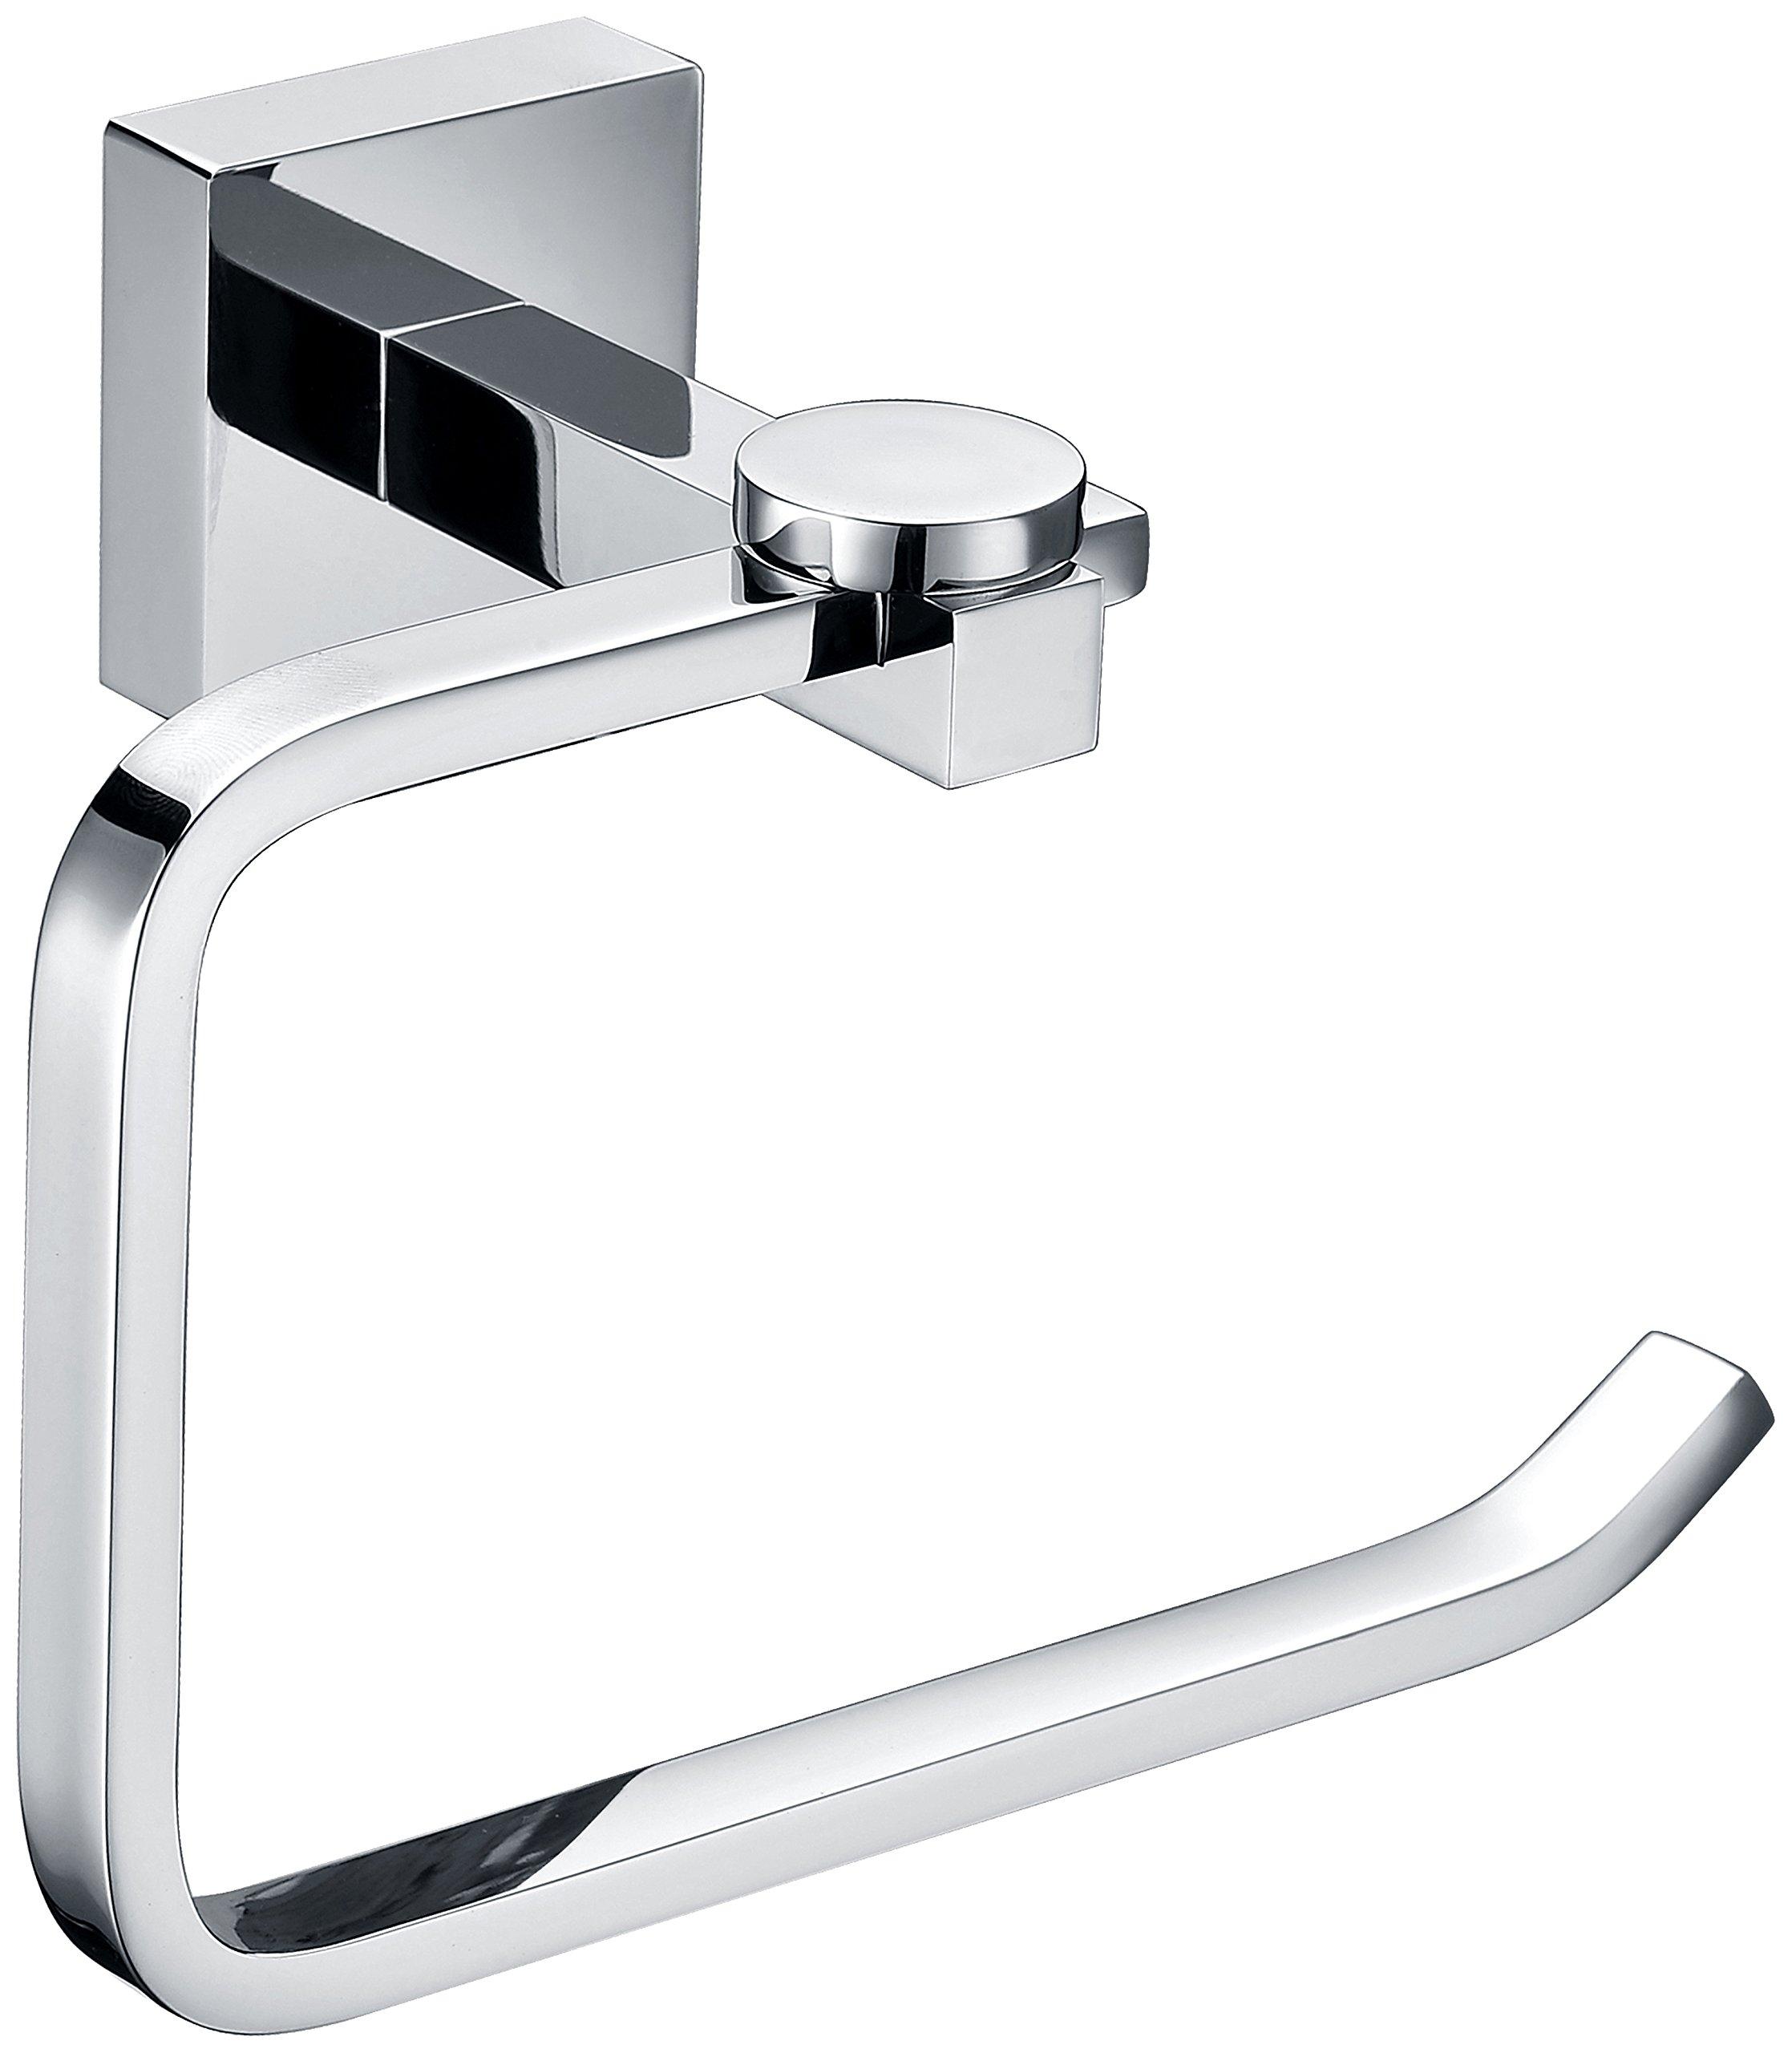 StarFashion Towel Ring, Polished Chrome, Towel Holder, Toilet Paper Holder, Wall Mount Square Open-Arm Towel Holder - Chrome Finish